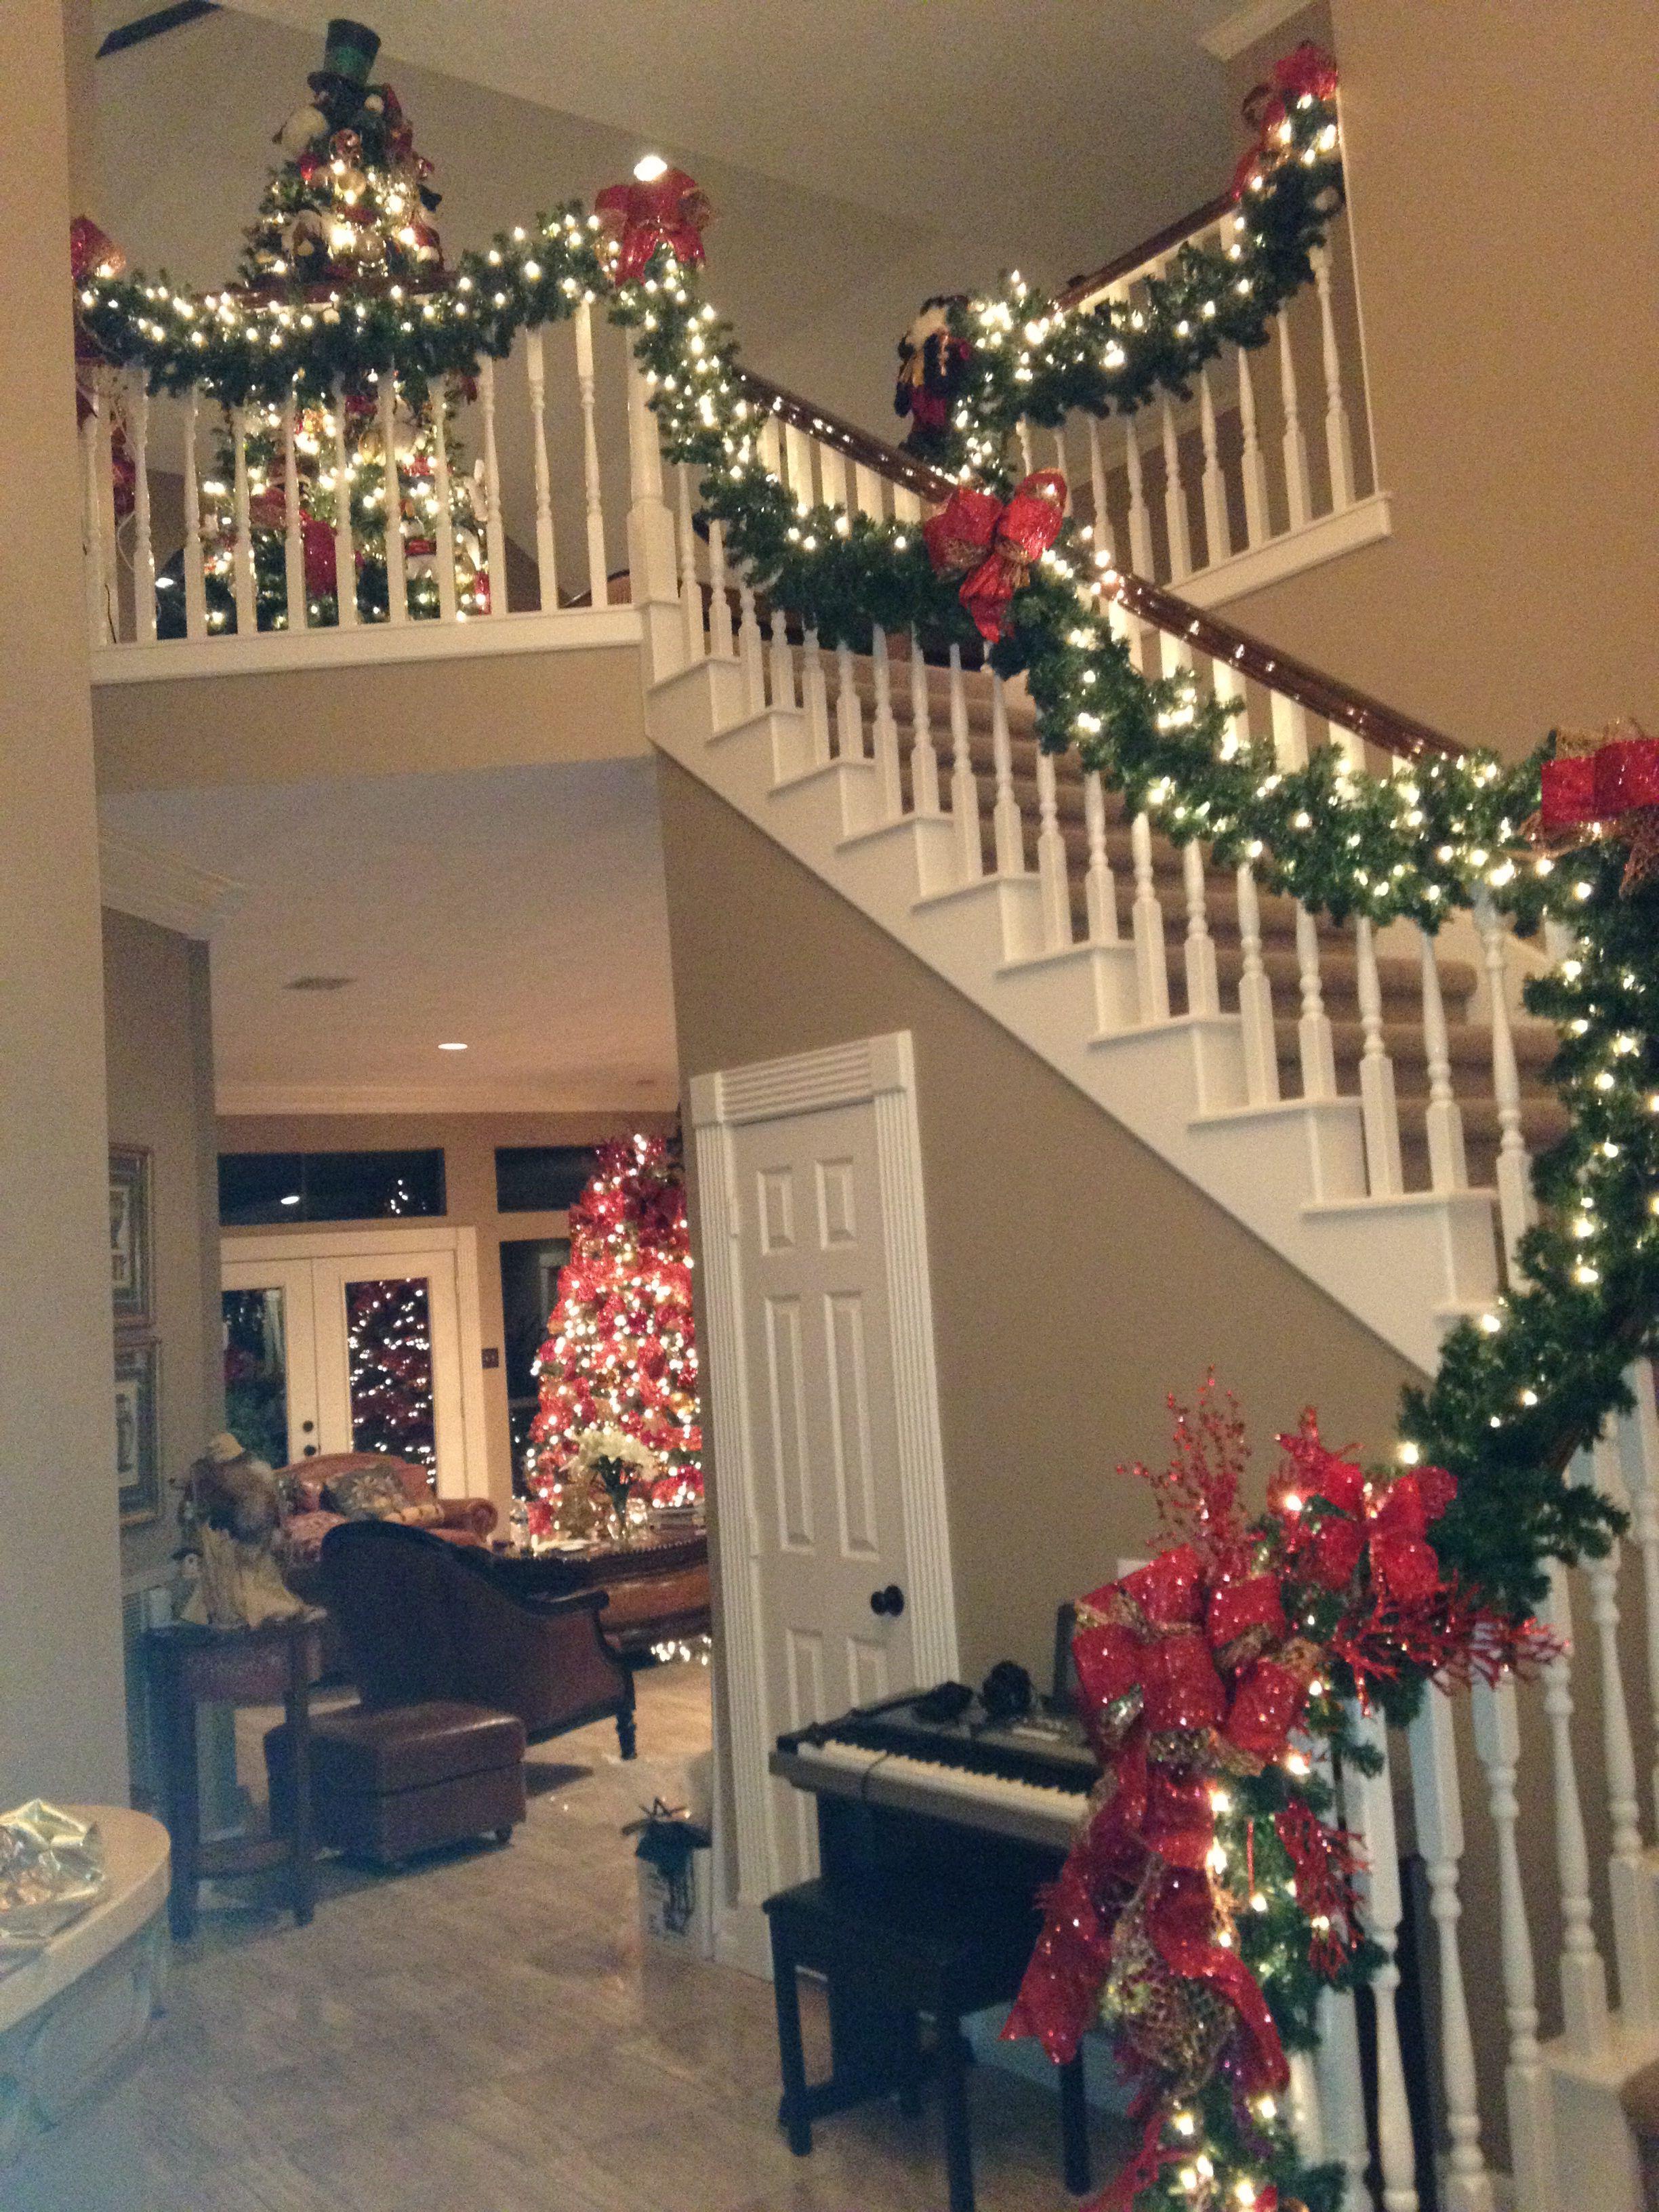 Wrap it Design | Holiday Decor | Pinterest | Christmas ...